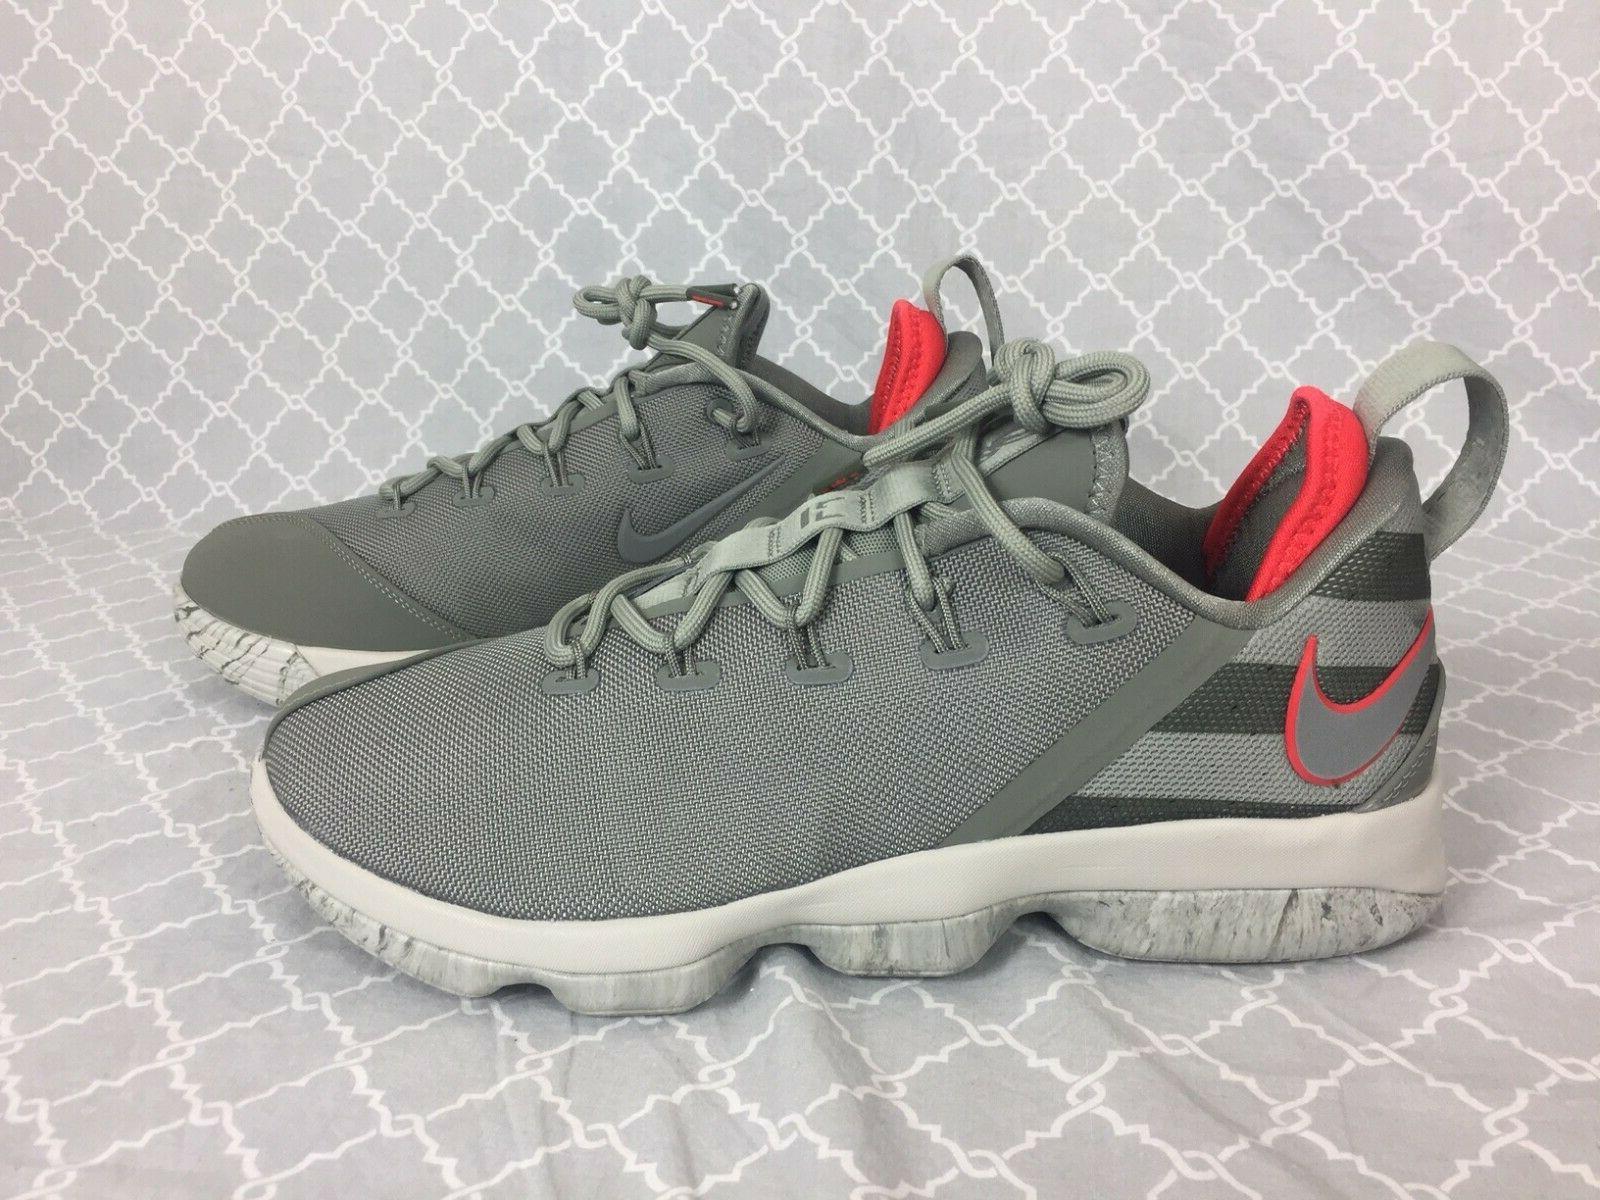 Nike Men's Basketball Shoes Stucco Multi Sizes